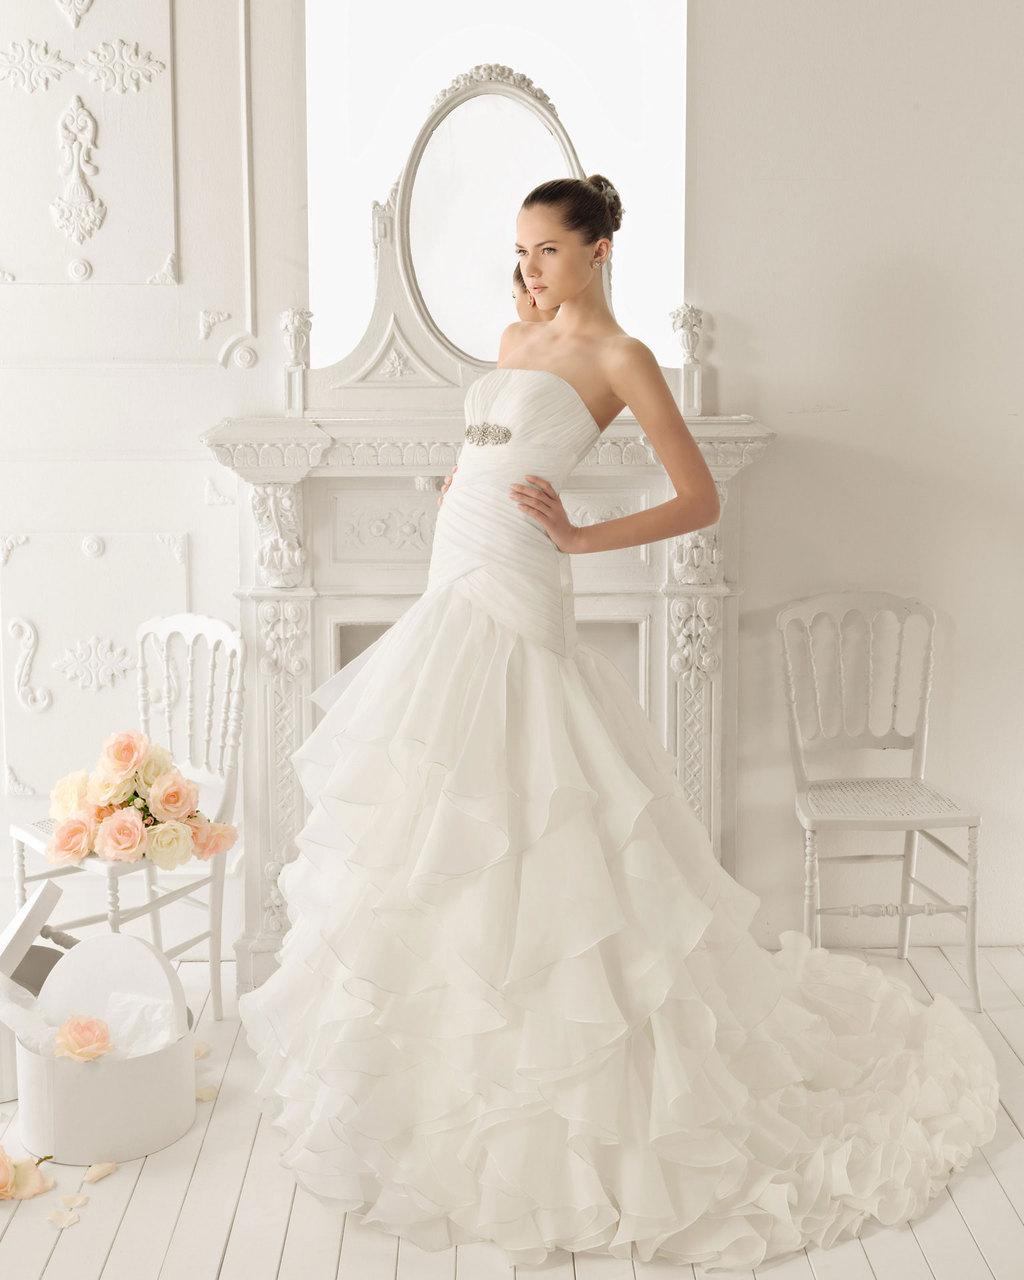 2013-wedding-dress-aire-barcelona-bridal-gowns-rotterdam.full